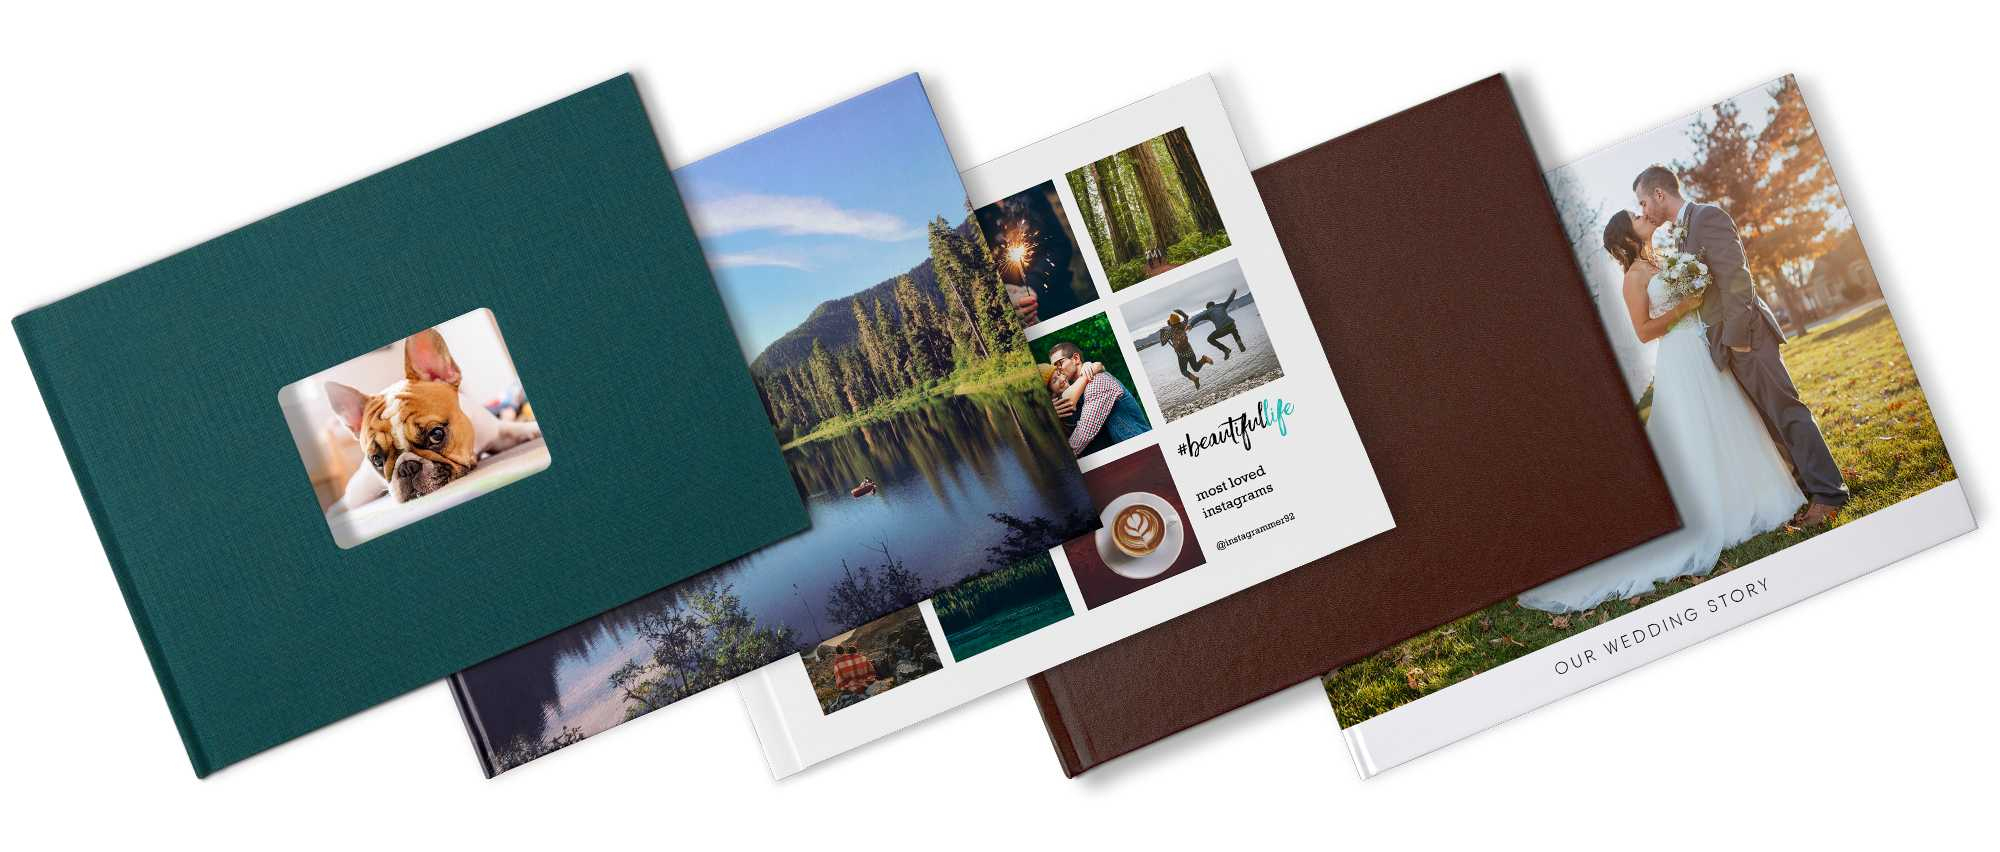 Photo Books | Make A Book | Custom Photo Books | Snapfish - Make A Printable Picture Book Online Free